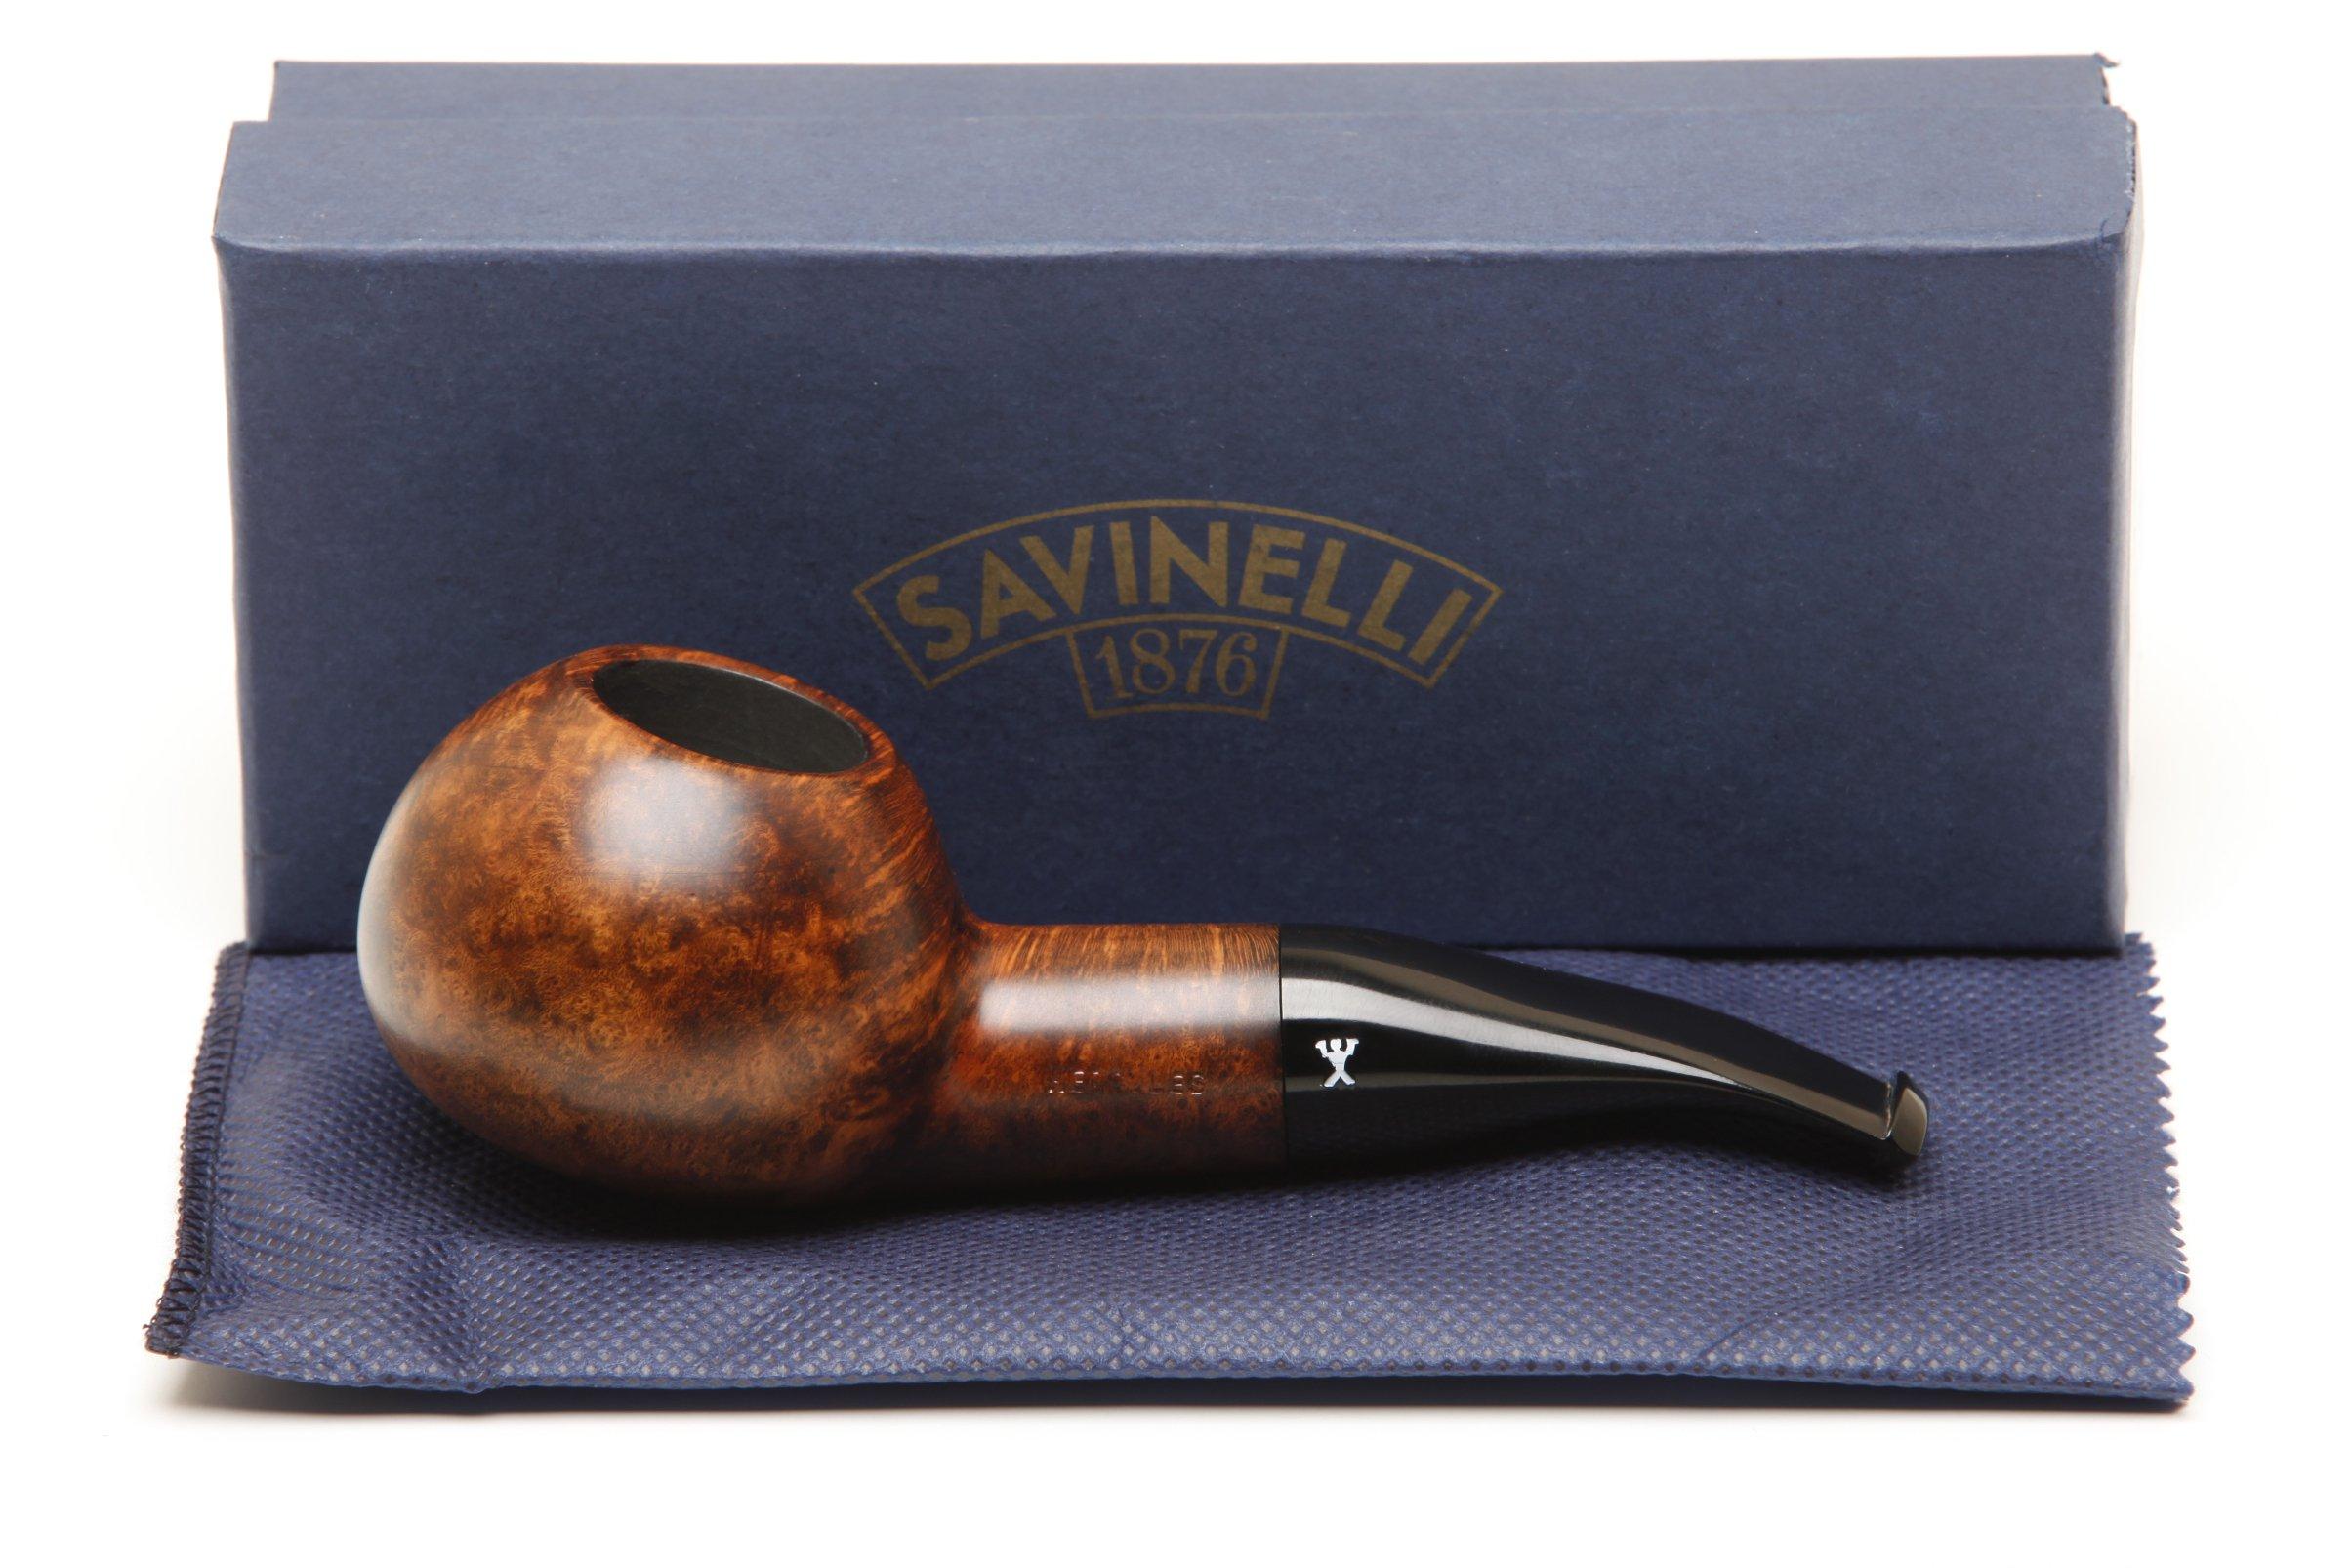 Savinelli Hercules Smooth 320 EX Tobacco Pipe